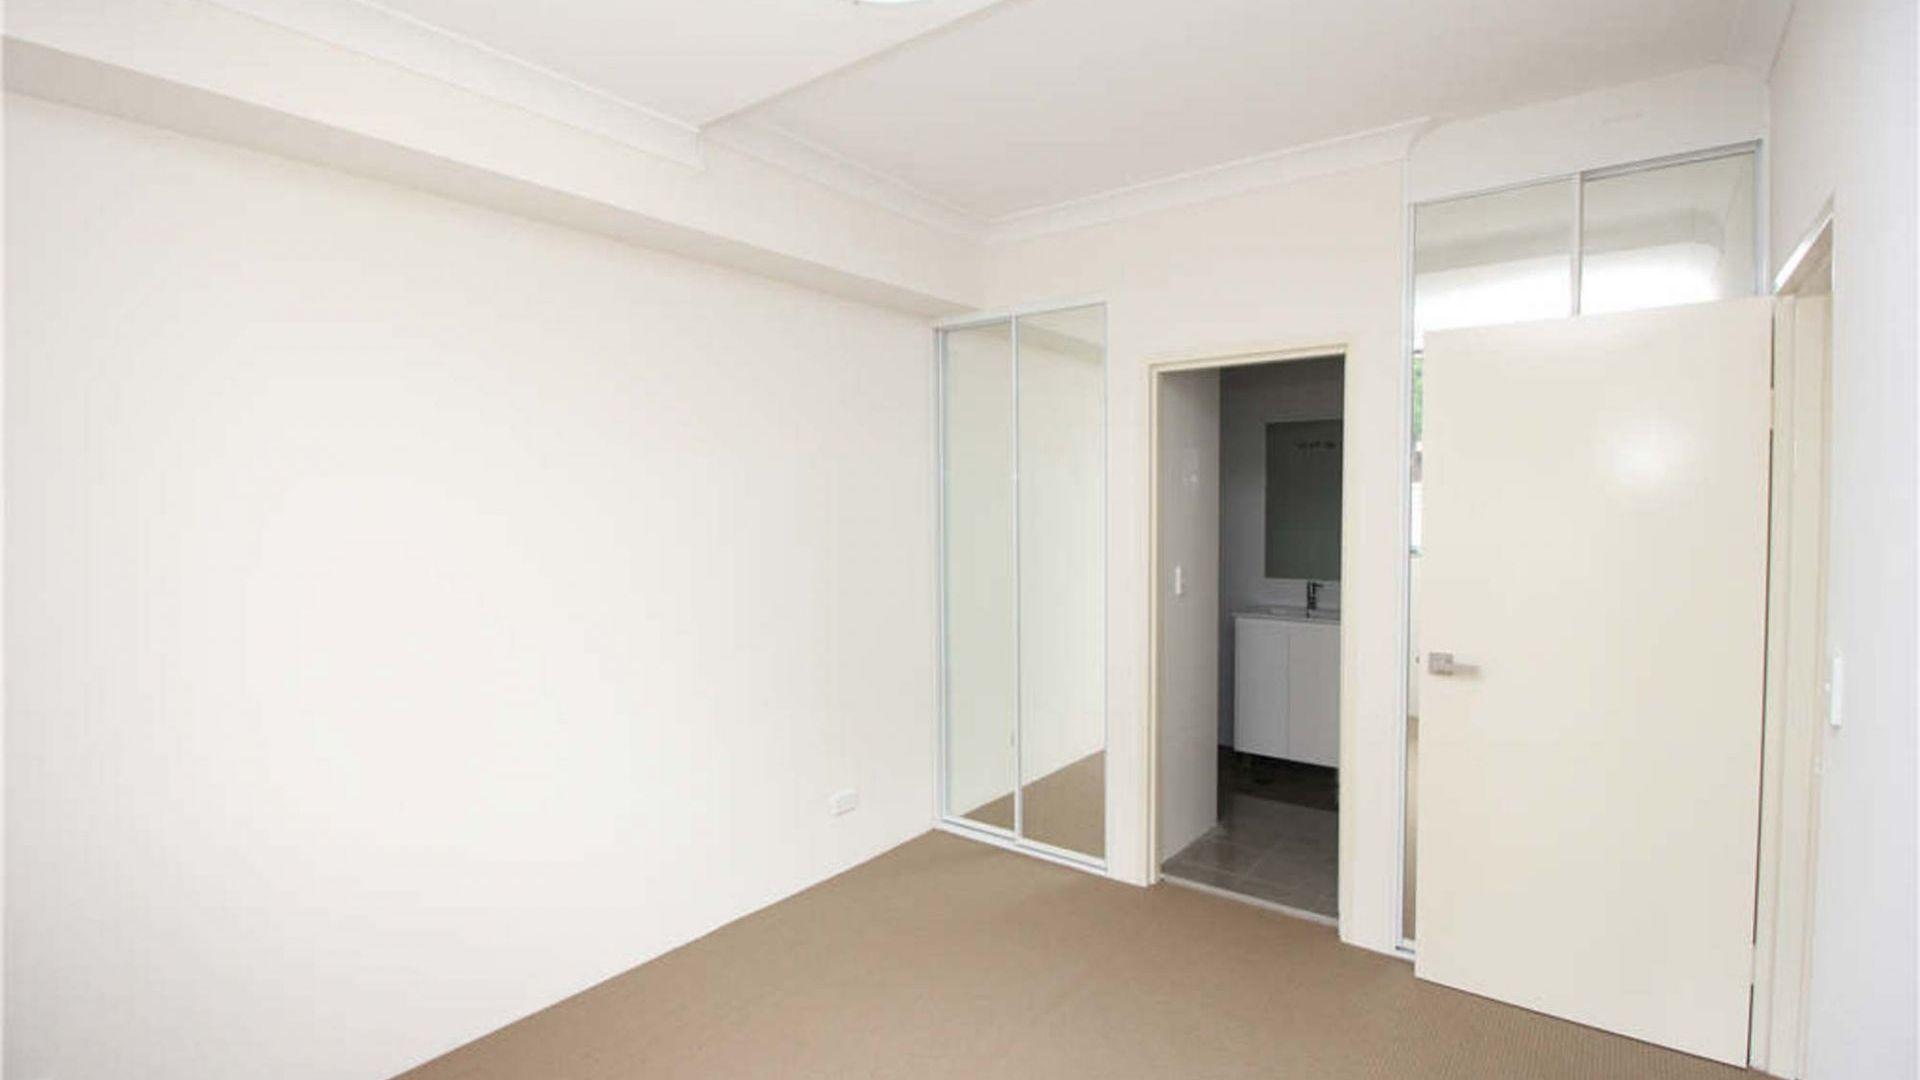 12/75 Great Western Hwy, Parramatta NSW 2150, Image 1